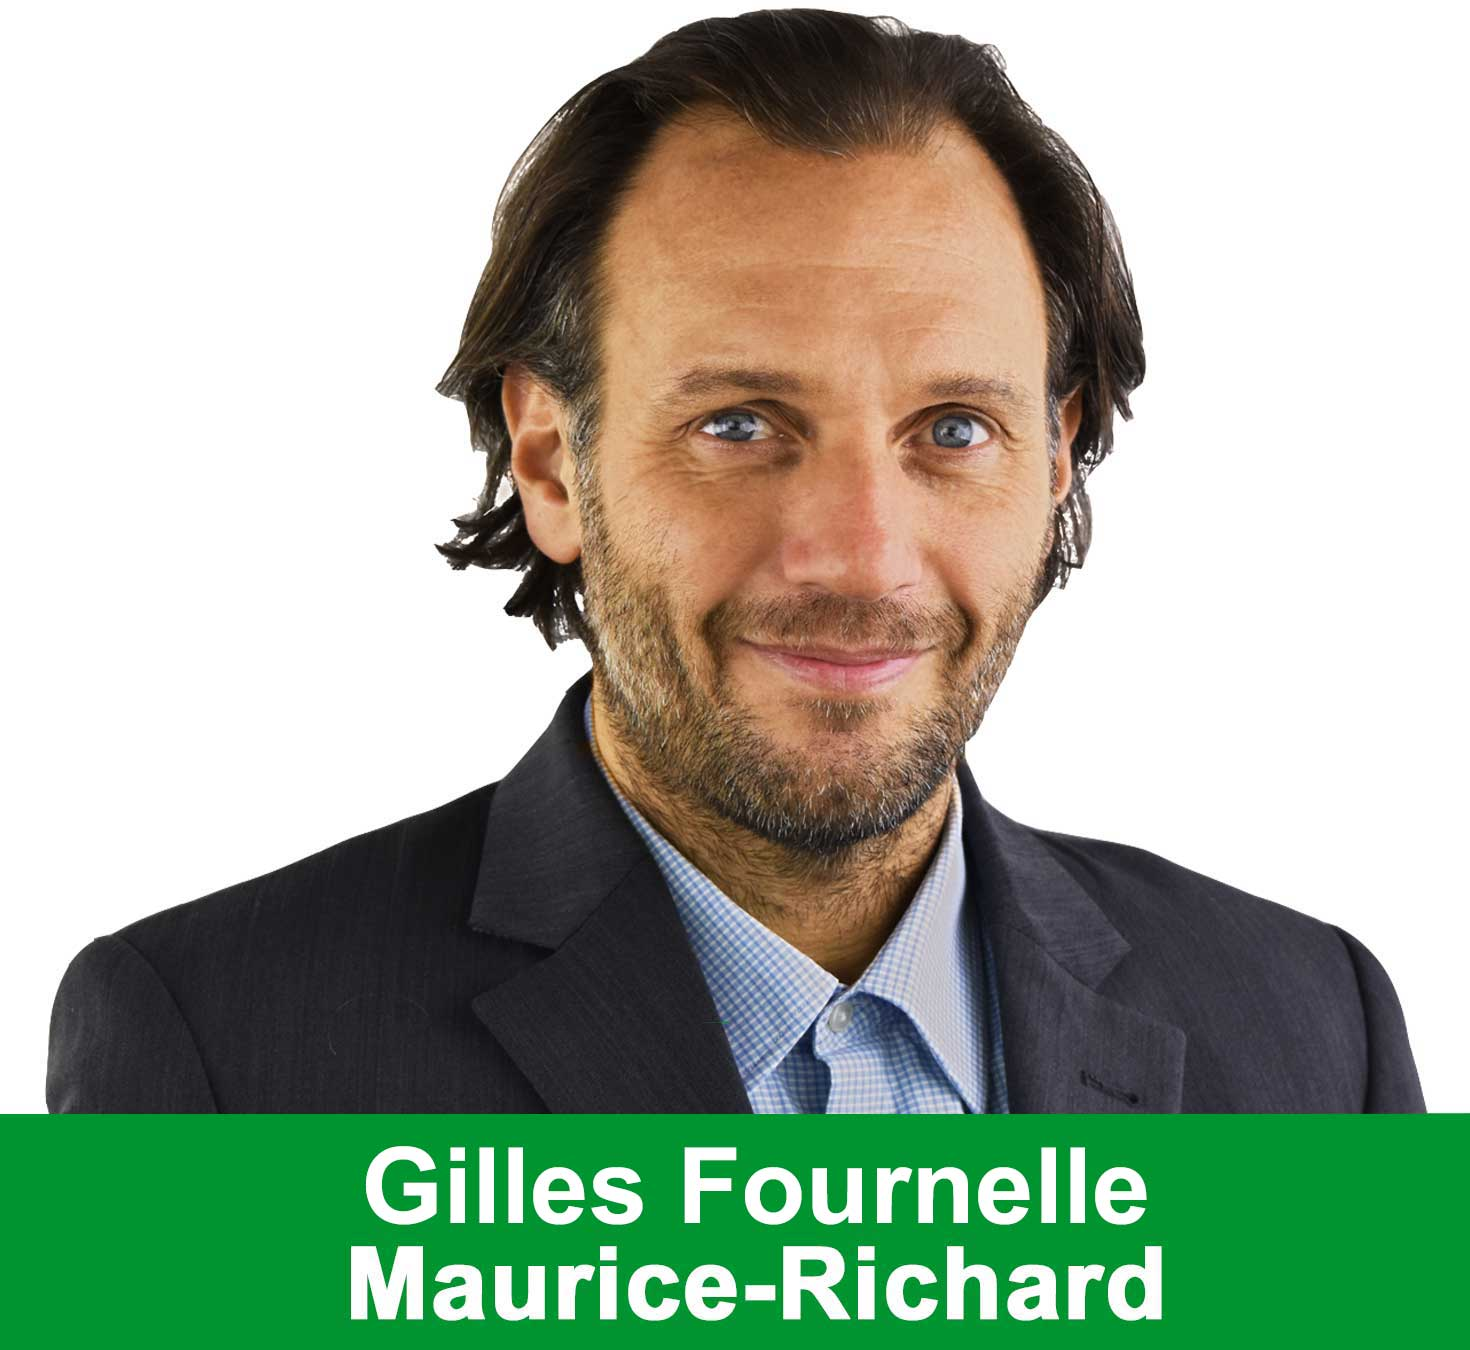 GillesSubpagex.jpg